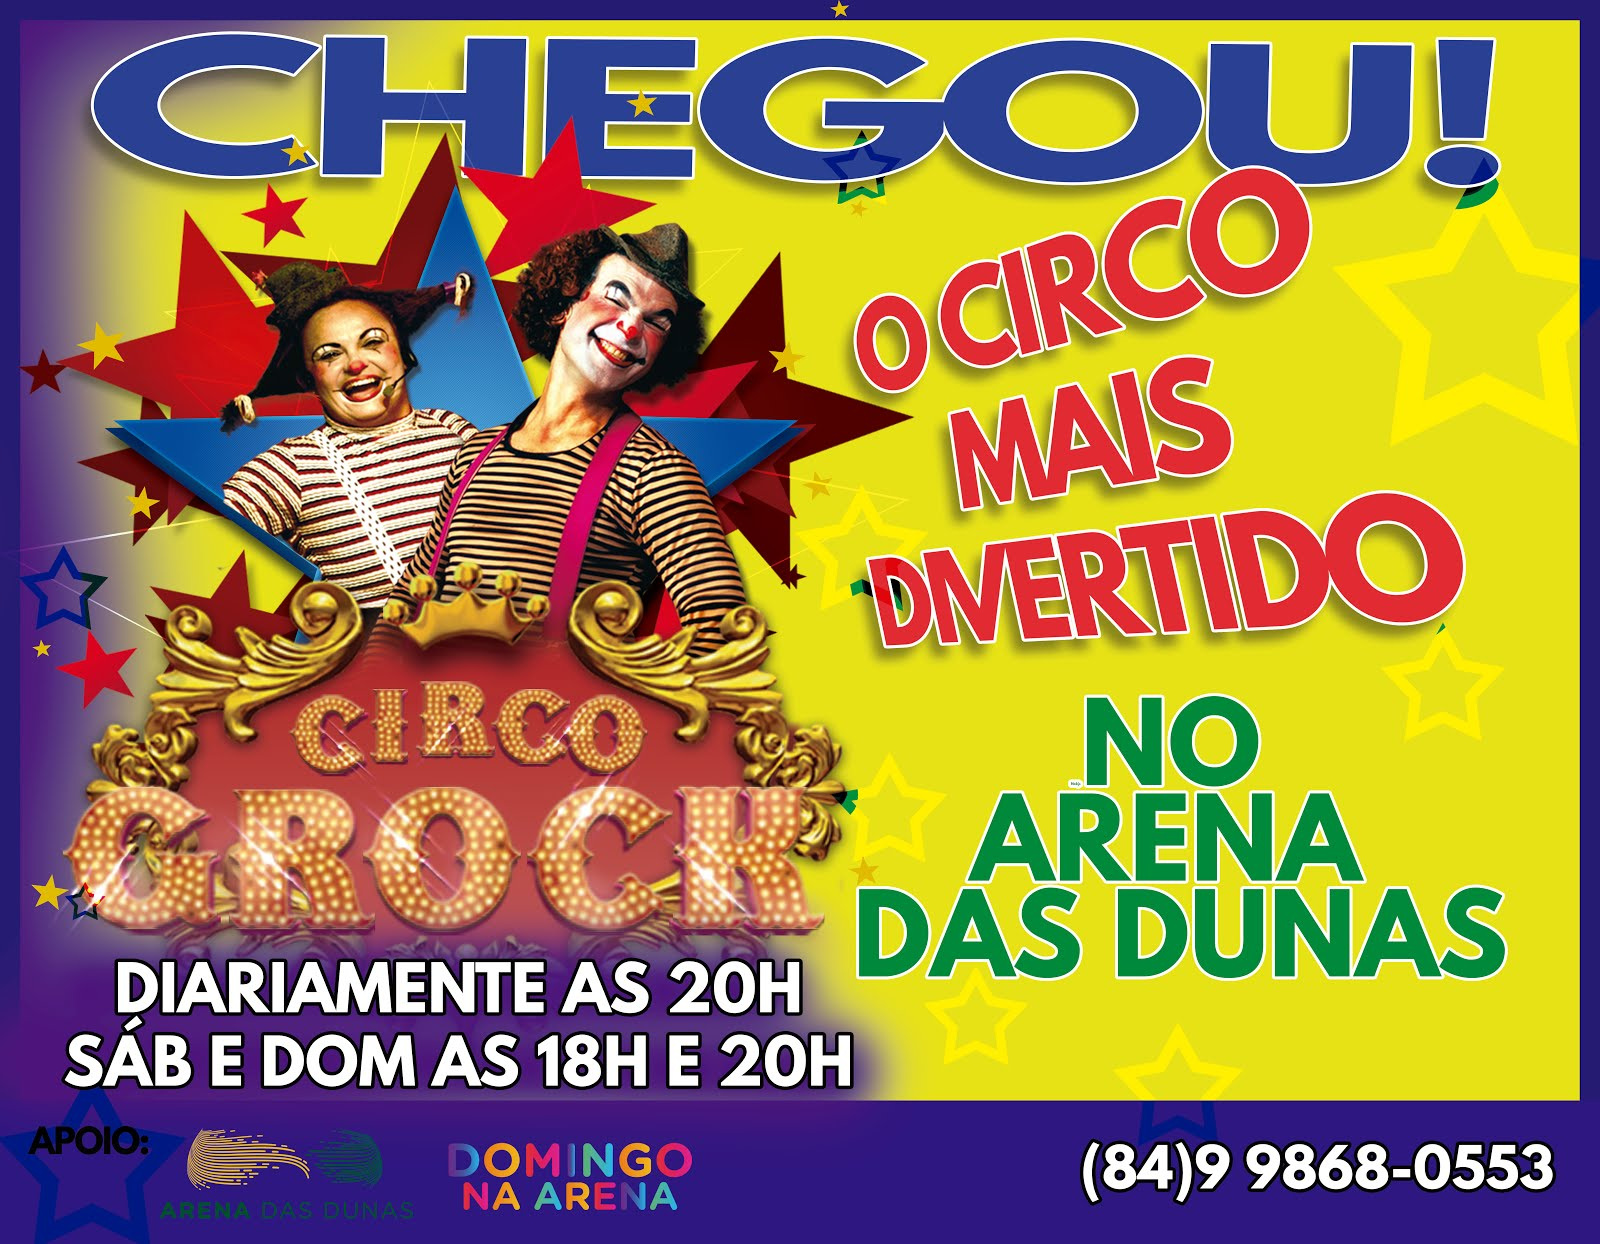 CIRCO GROCK EM NATAL